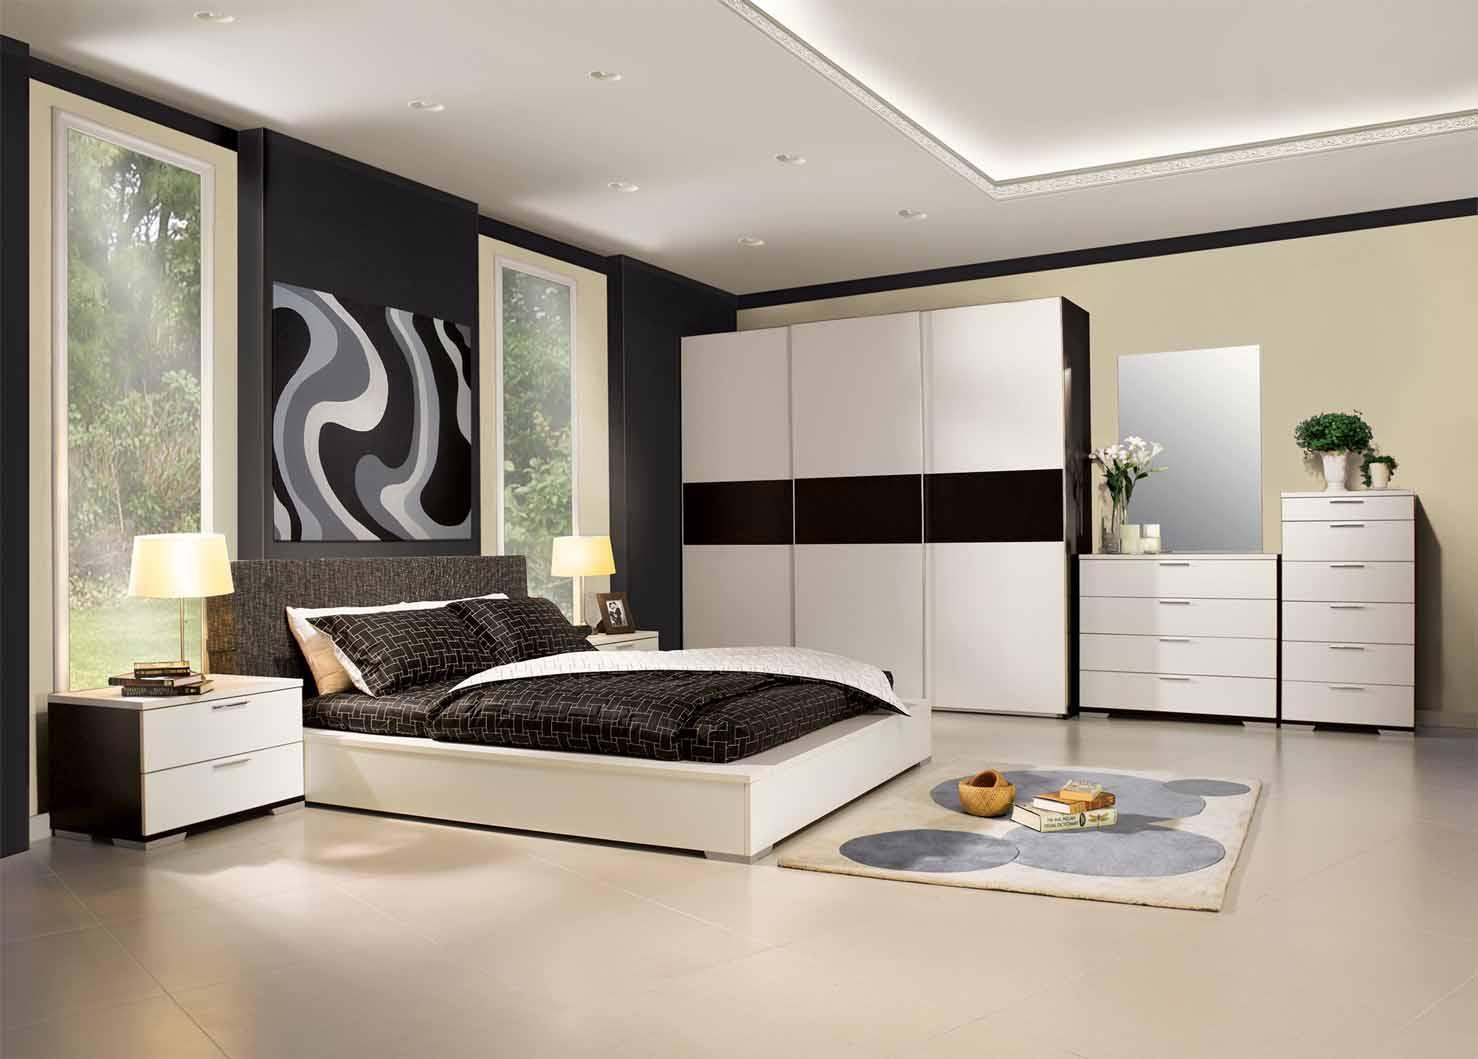 popular interior house ideas blogger